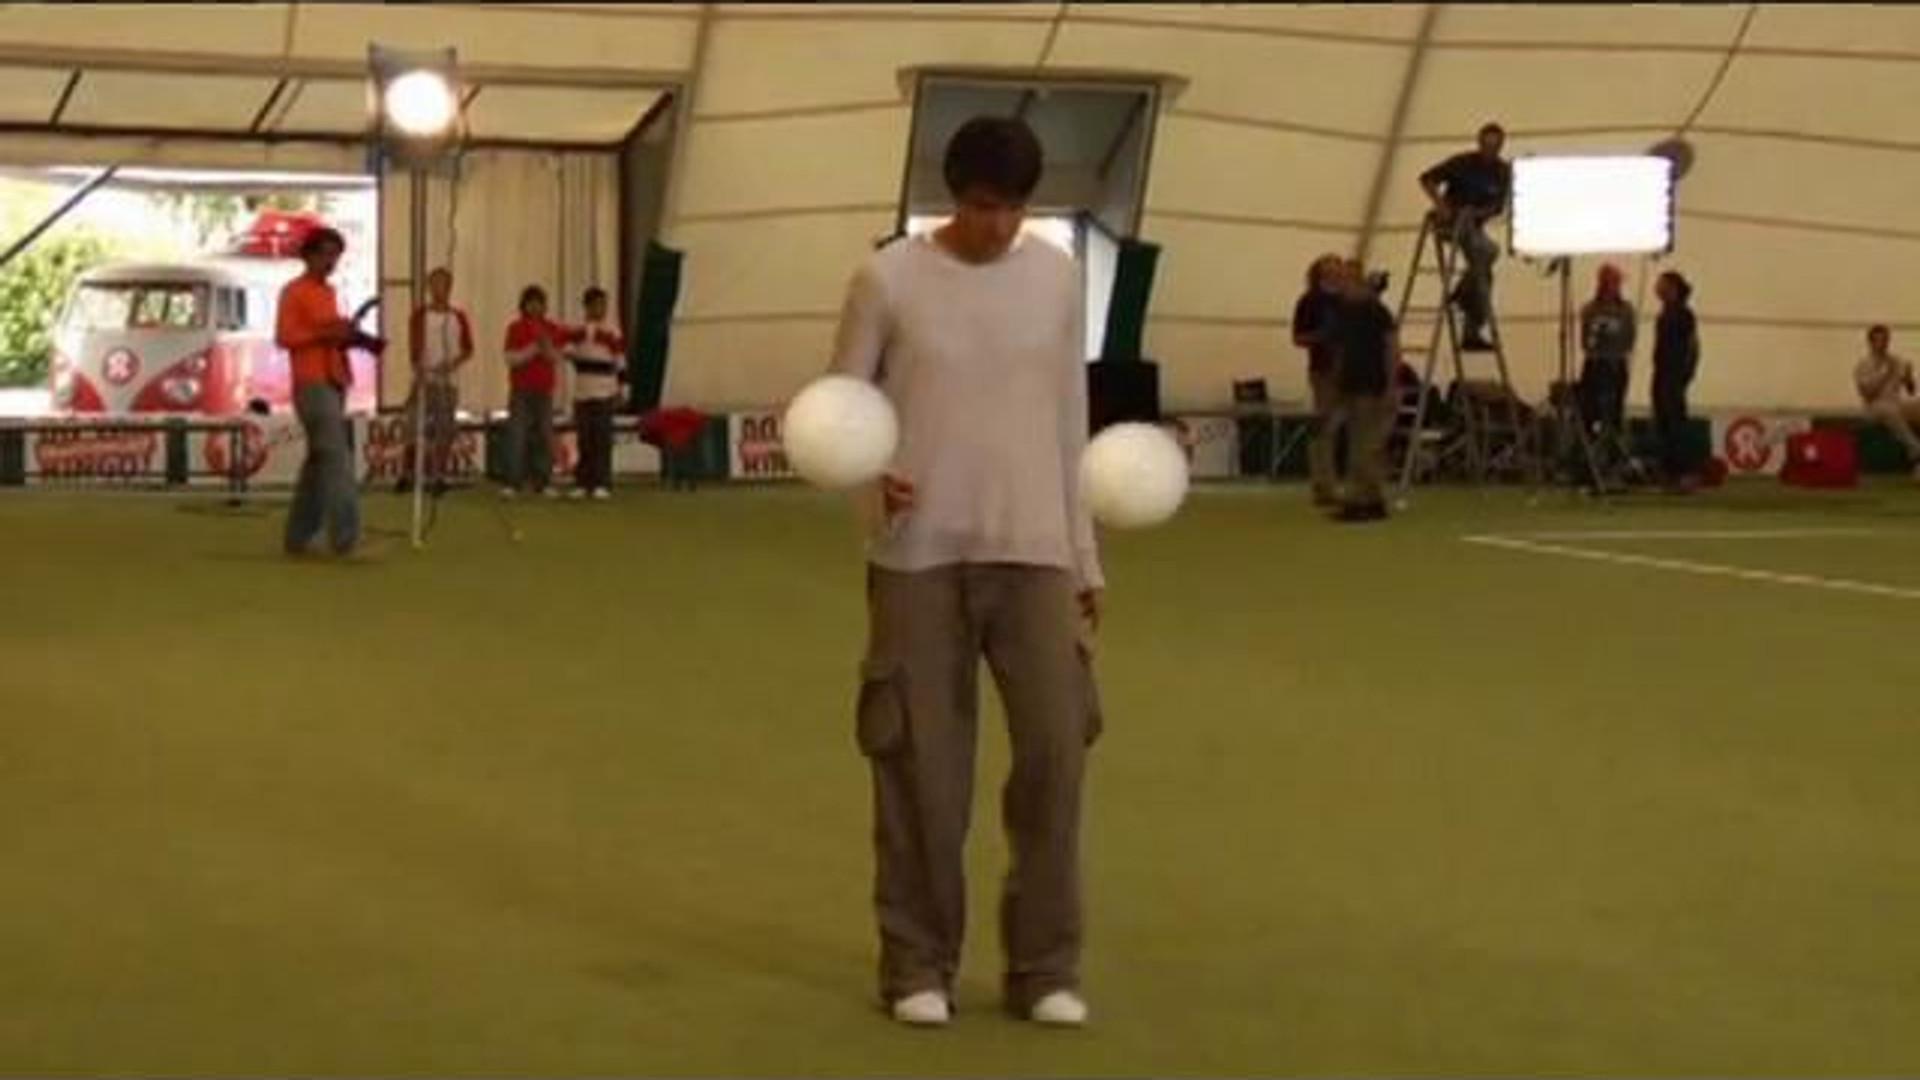 RINGO 'Kaka plays with 2 balls'